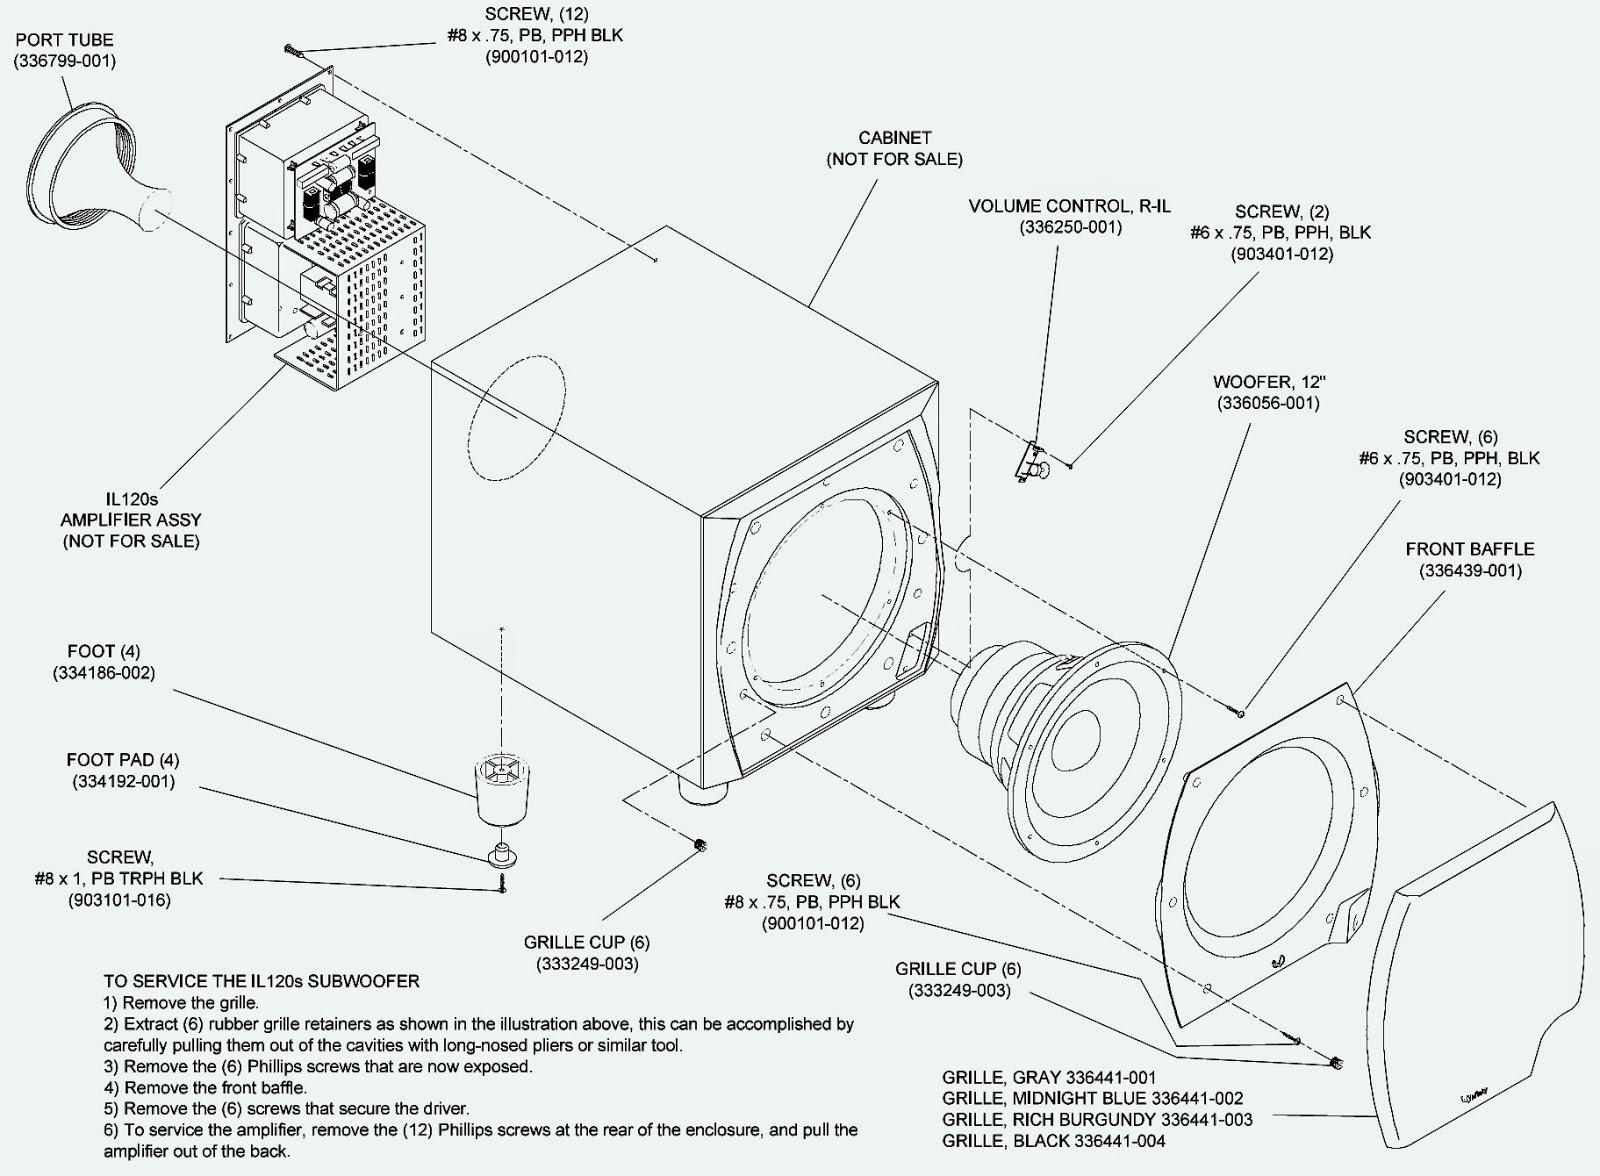 Infinity Il120s Sub Woofer Bias Adjustment Disassemble